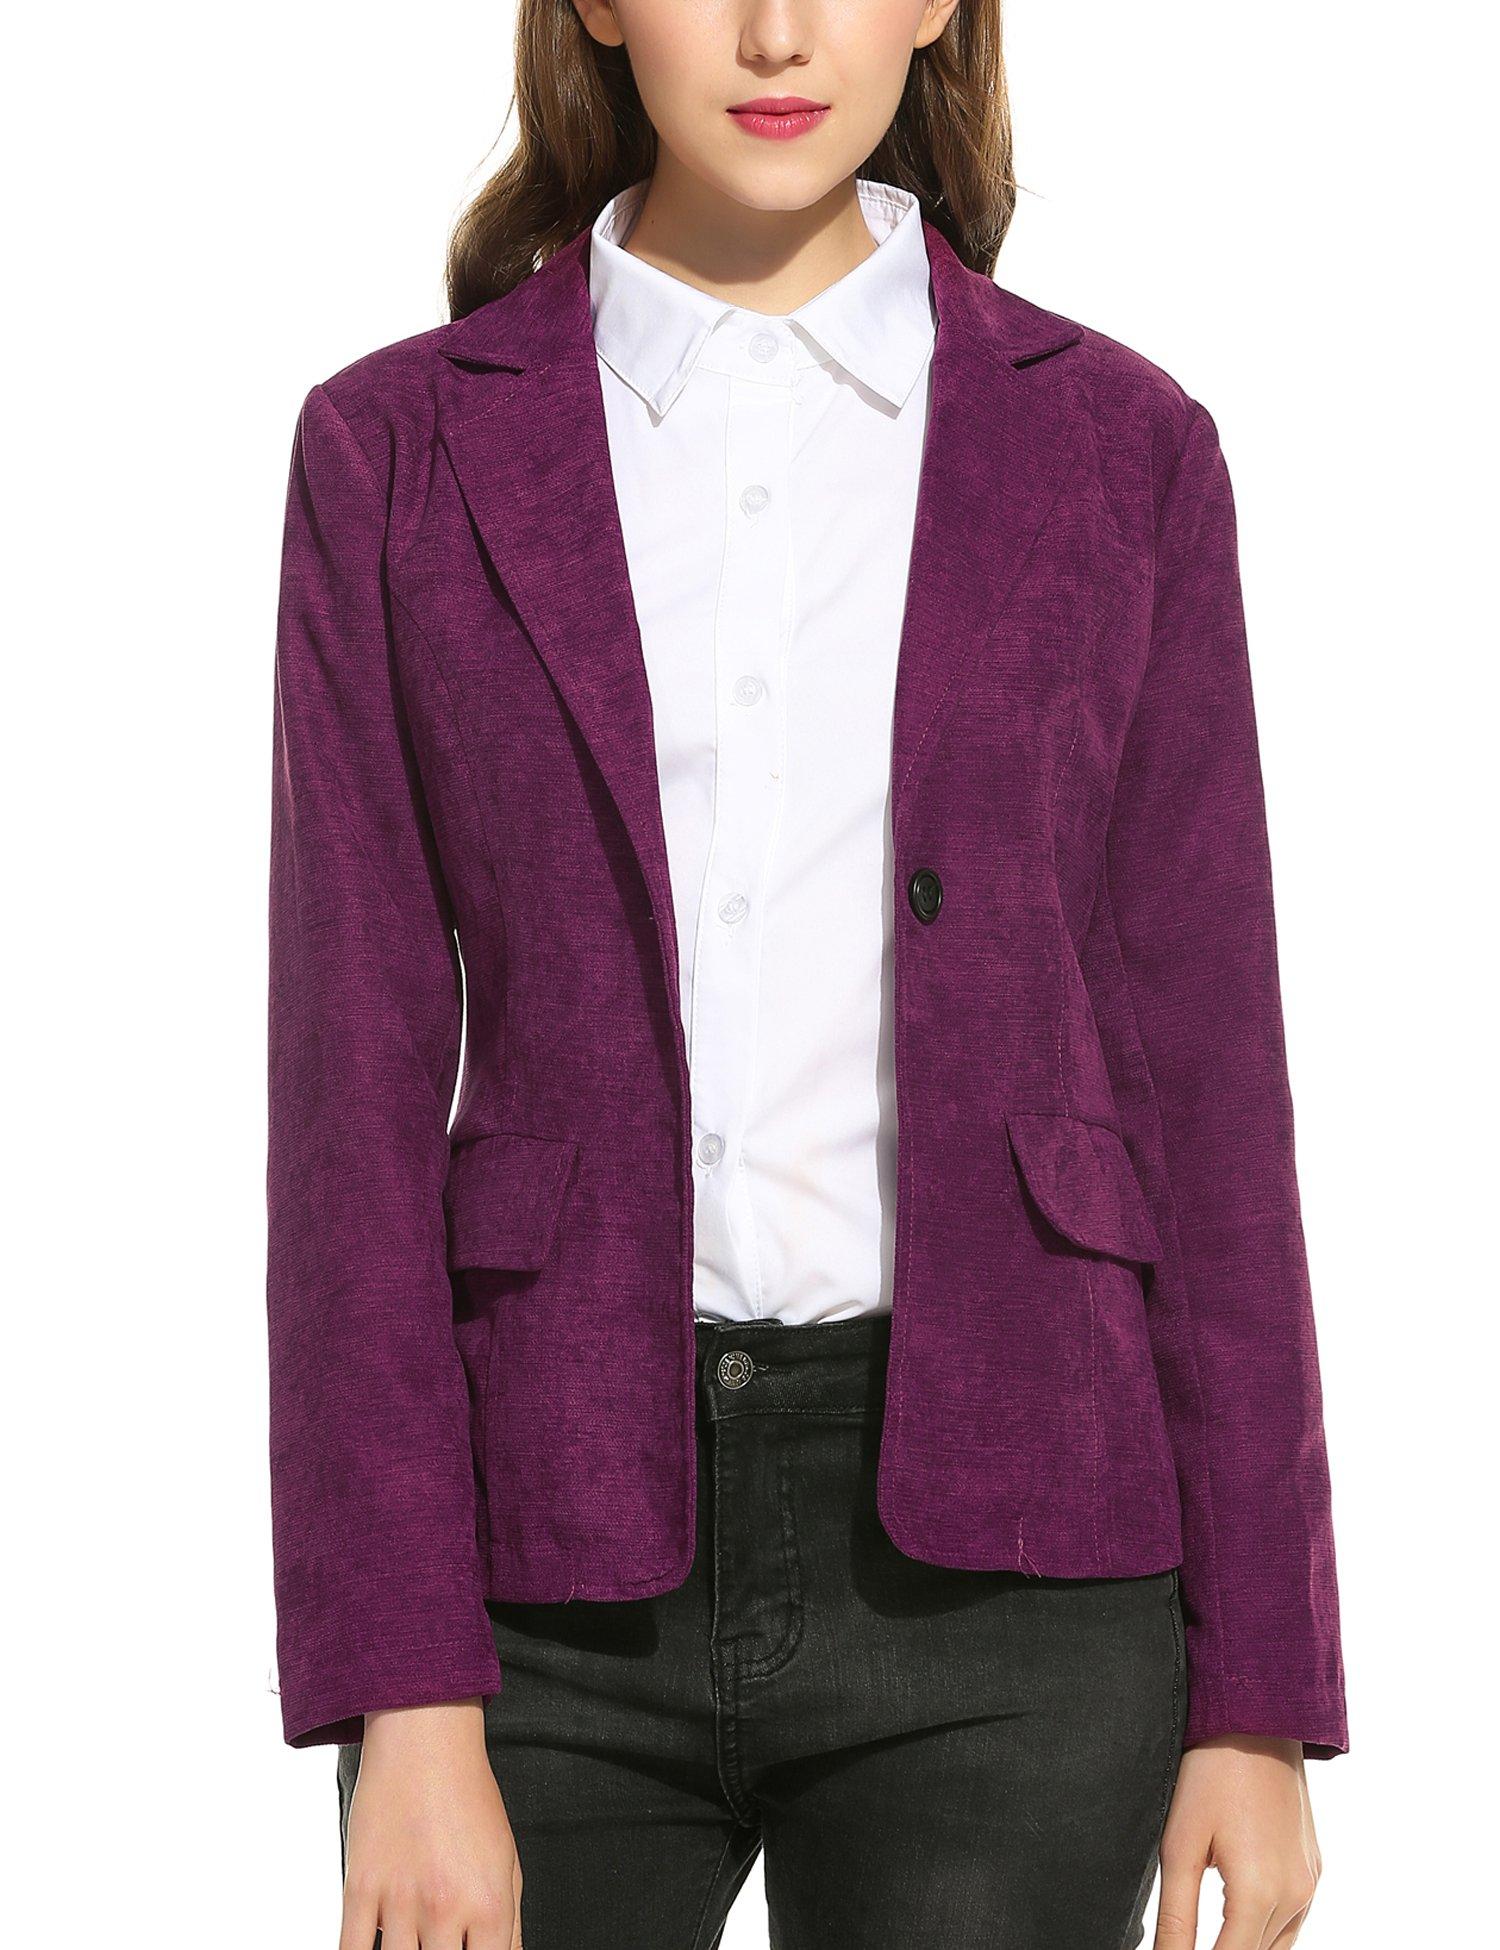 SE MIU Womens Casual One Button Work Office Corduroy Blazer Jacket Slim Suits Coat, Purple, Small